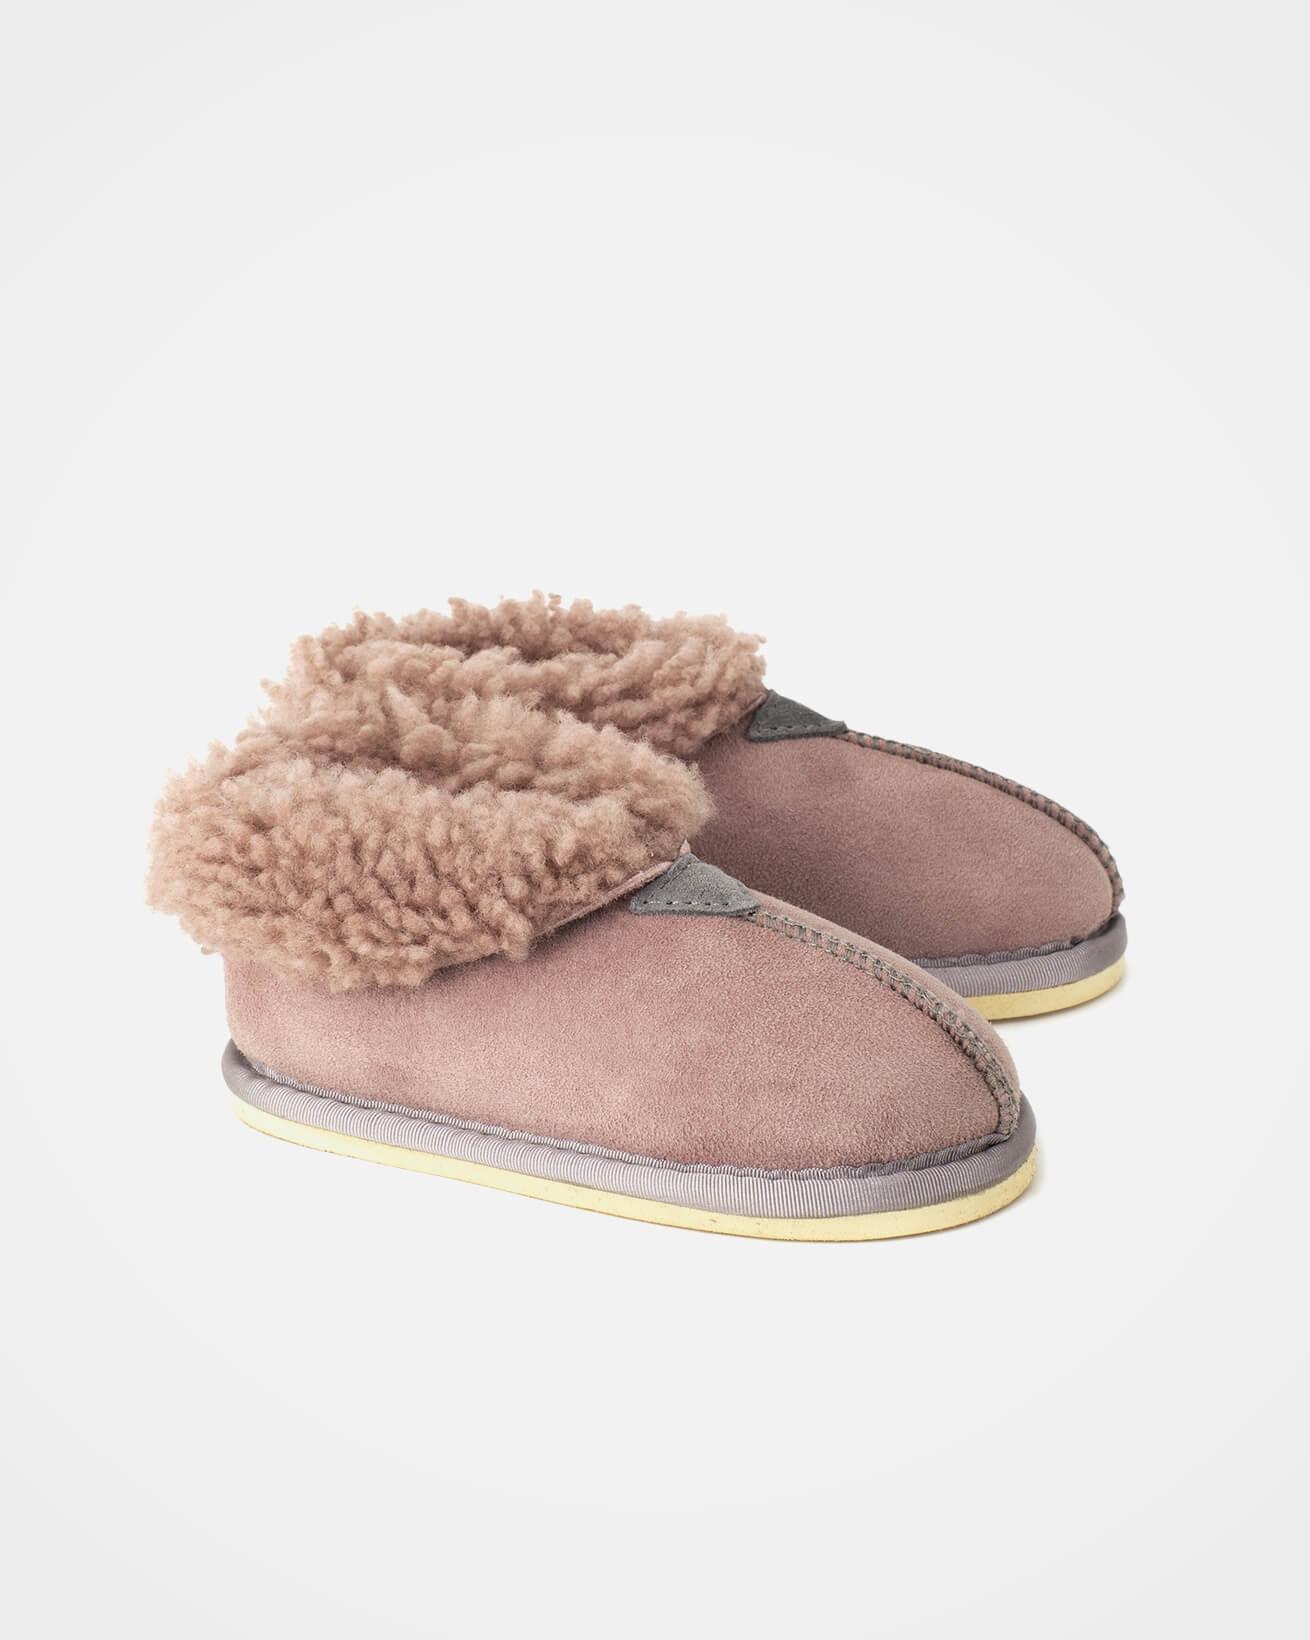 Kids Bootee Slipper- Size 9-10 - Dusty Pink - 1596